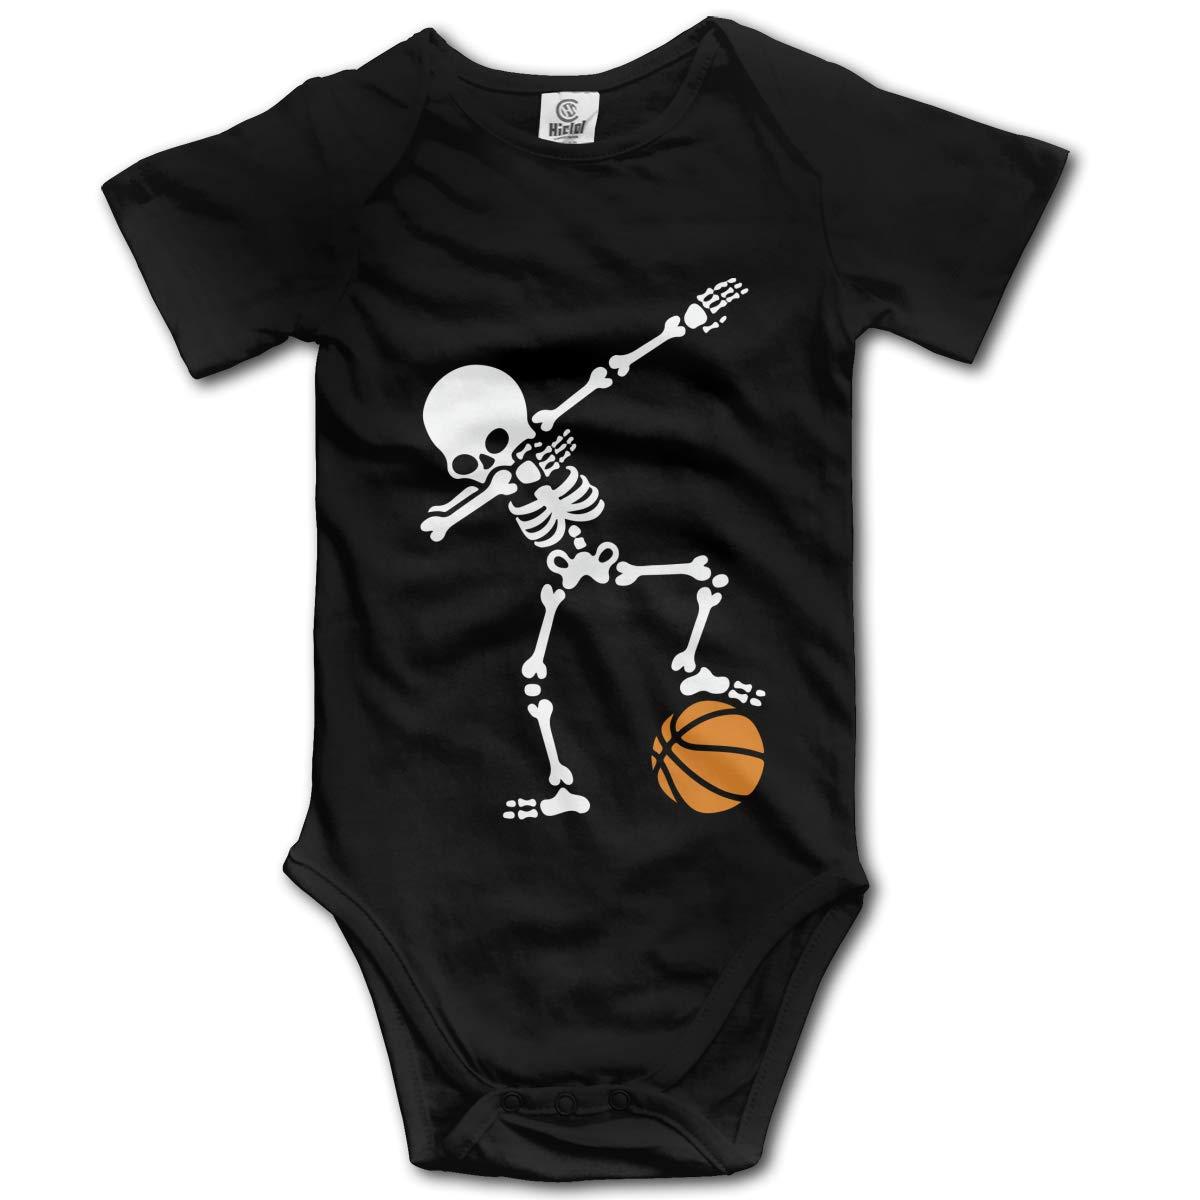 Dab Dabbing Skeleton Basketball Unisex Solid Baby 100/% Organic Cotton Romper Bodysuit Tops 0-24 Months